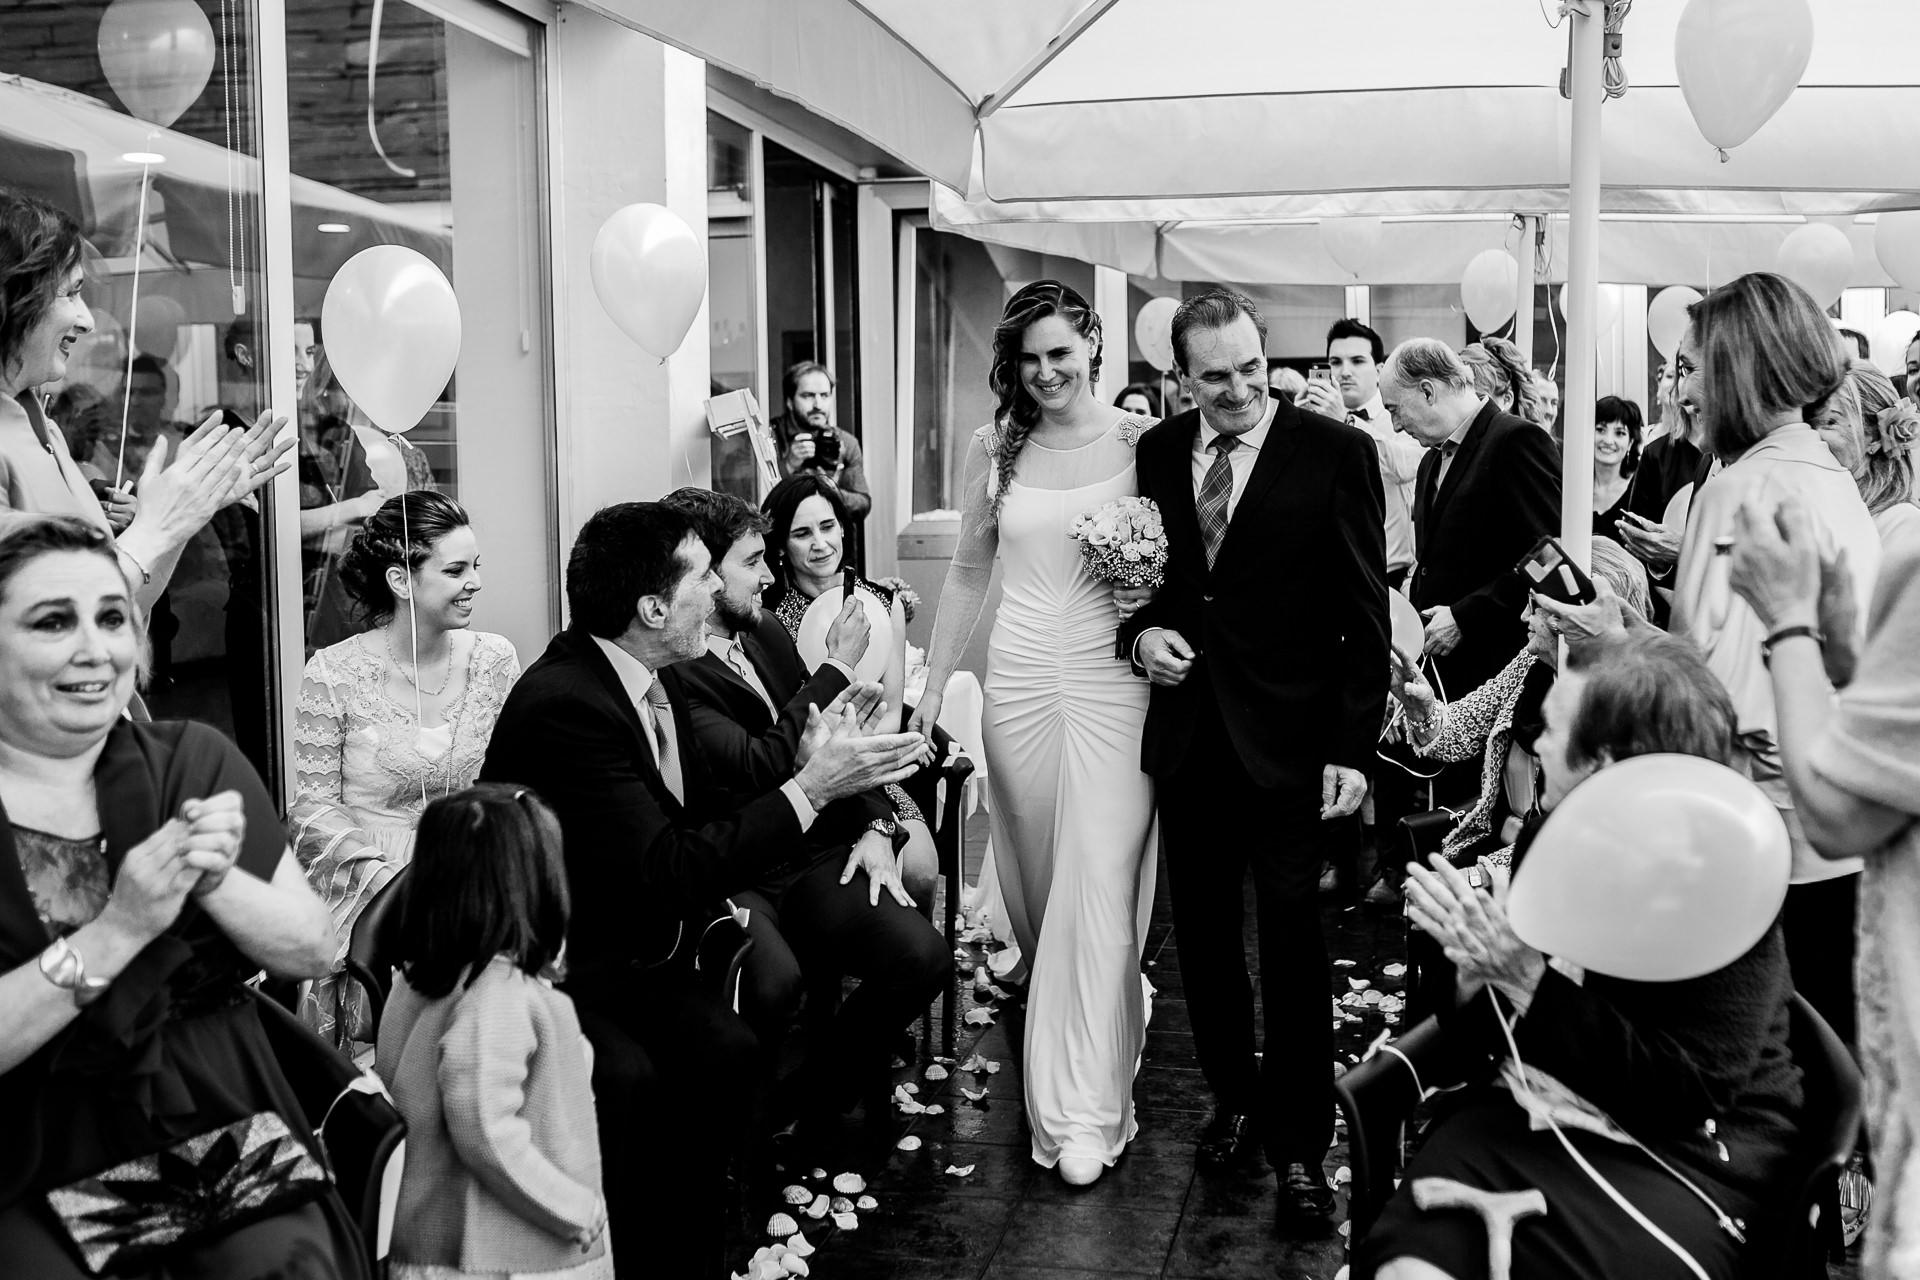 boda civil sagardotegi sidrería arizia zarautz 131314